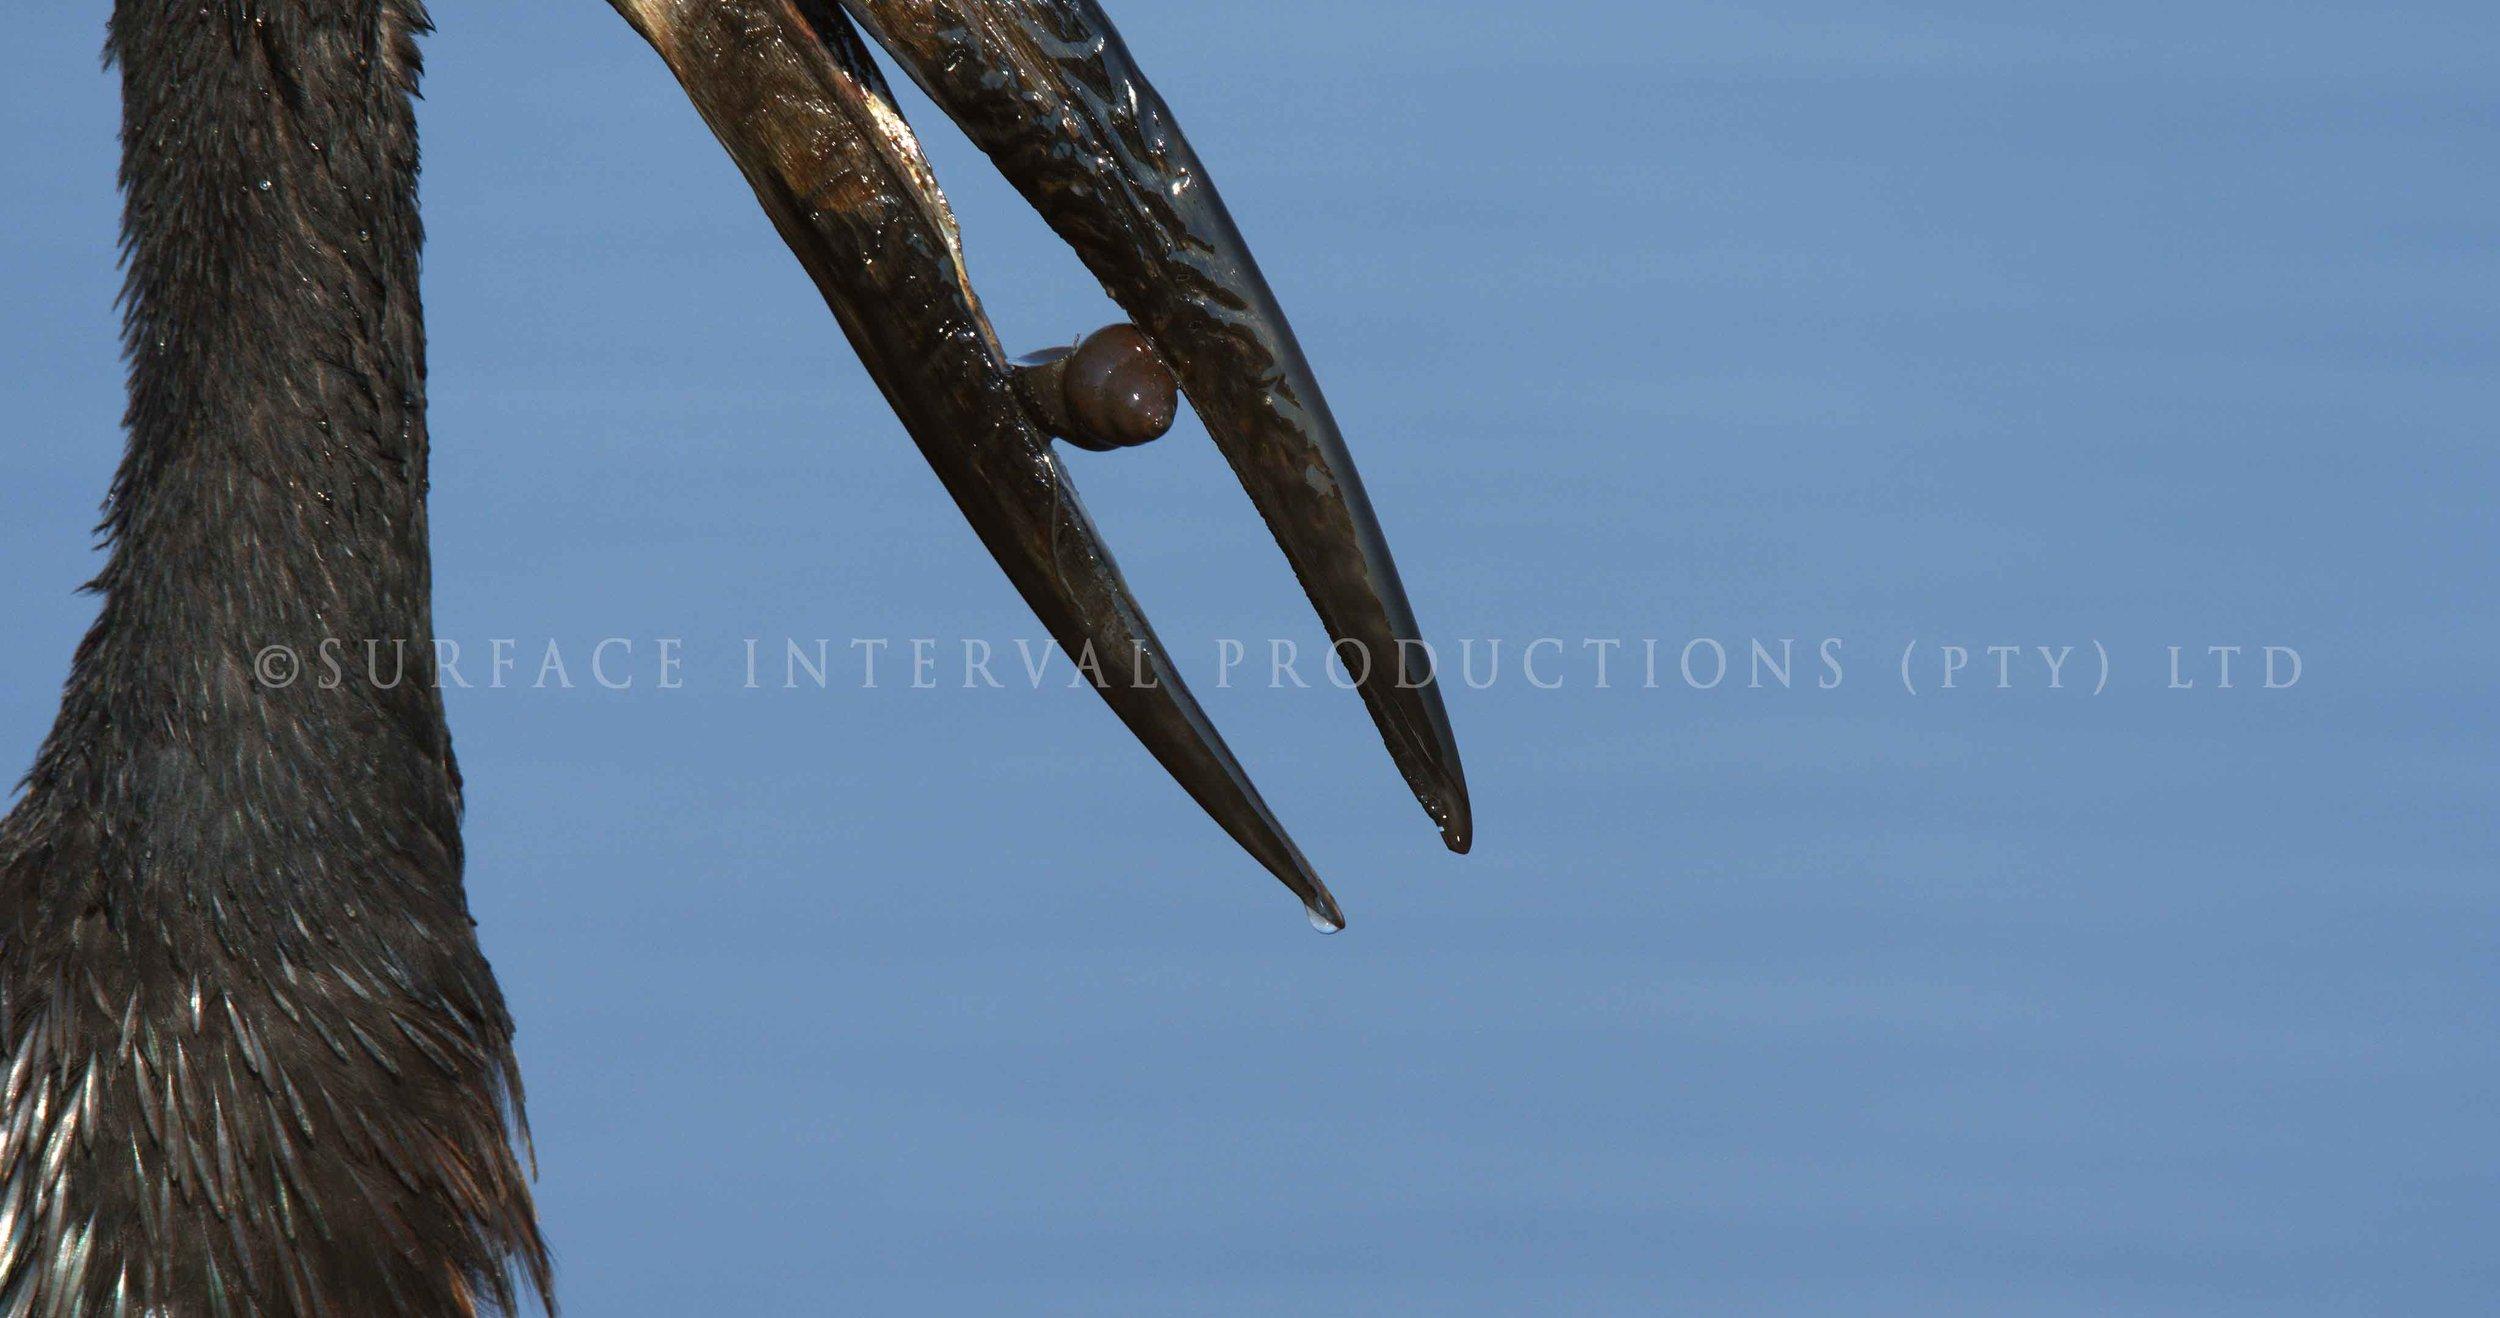 Openbill stork 003s.jpg